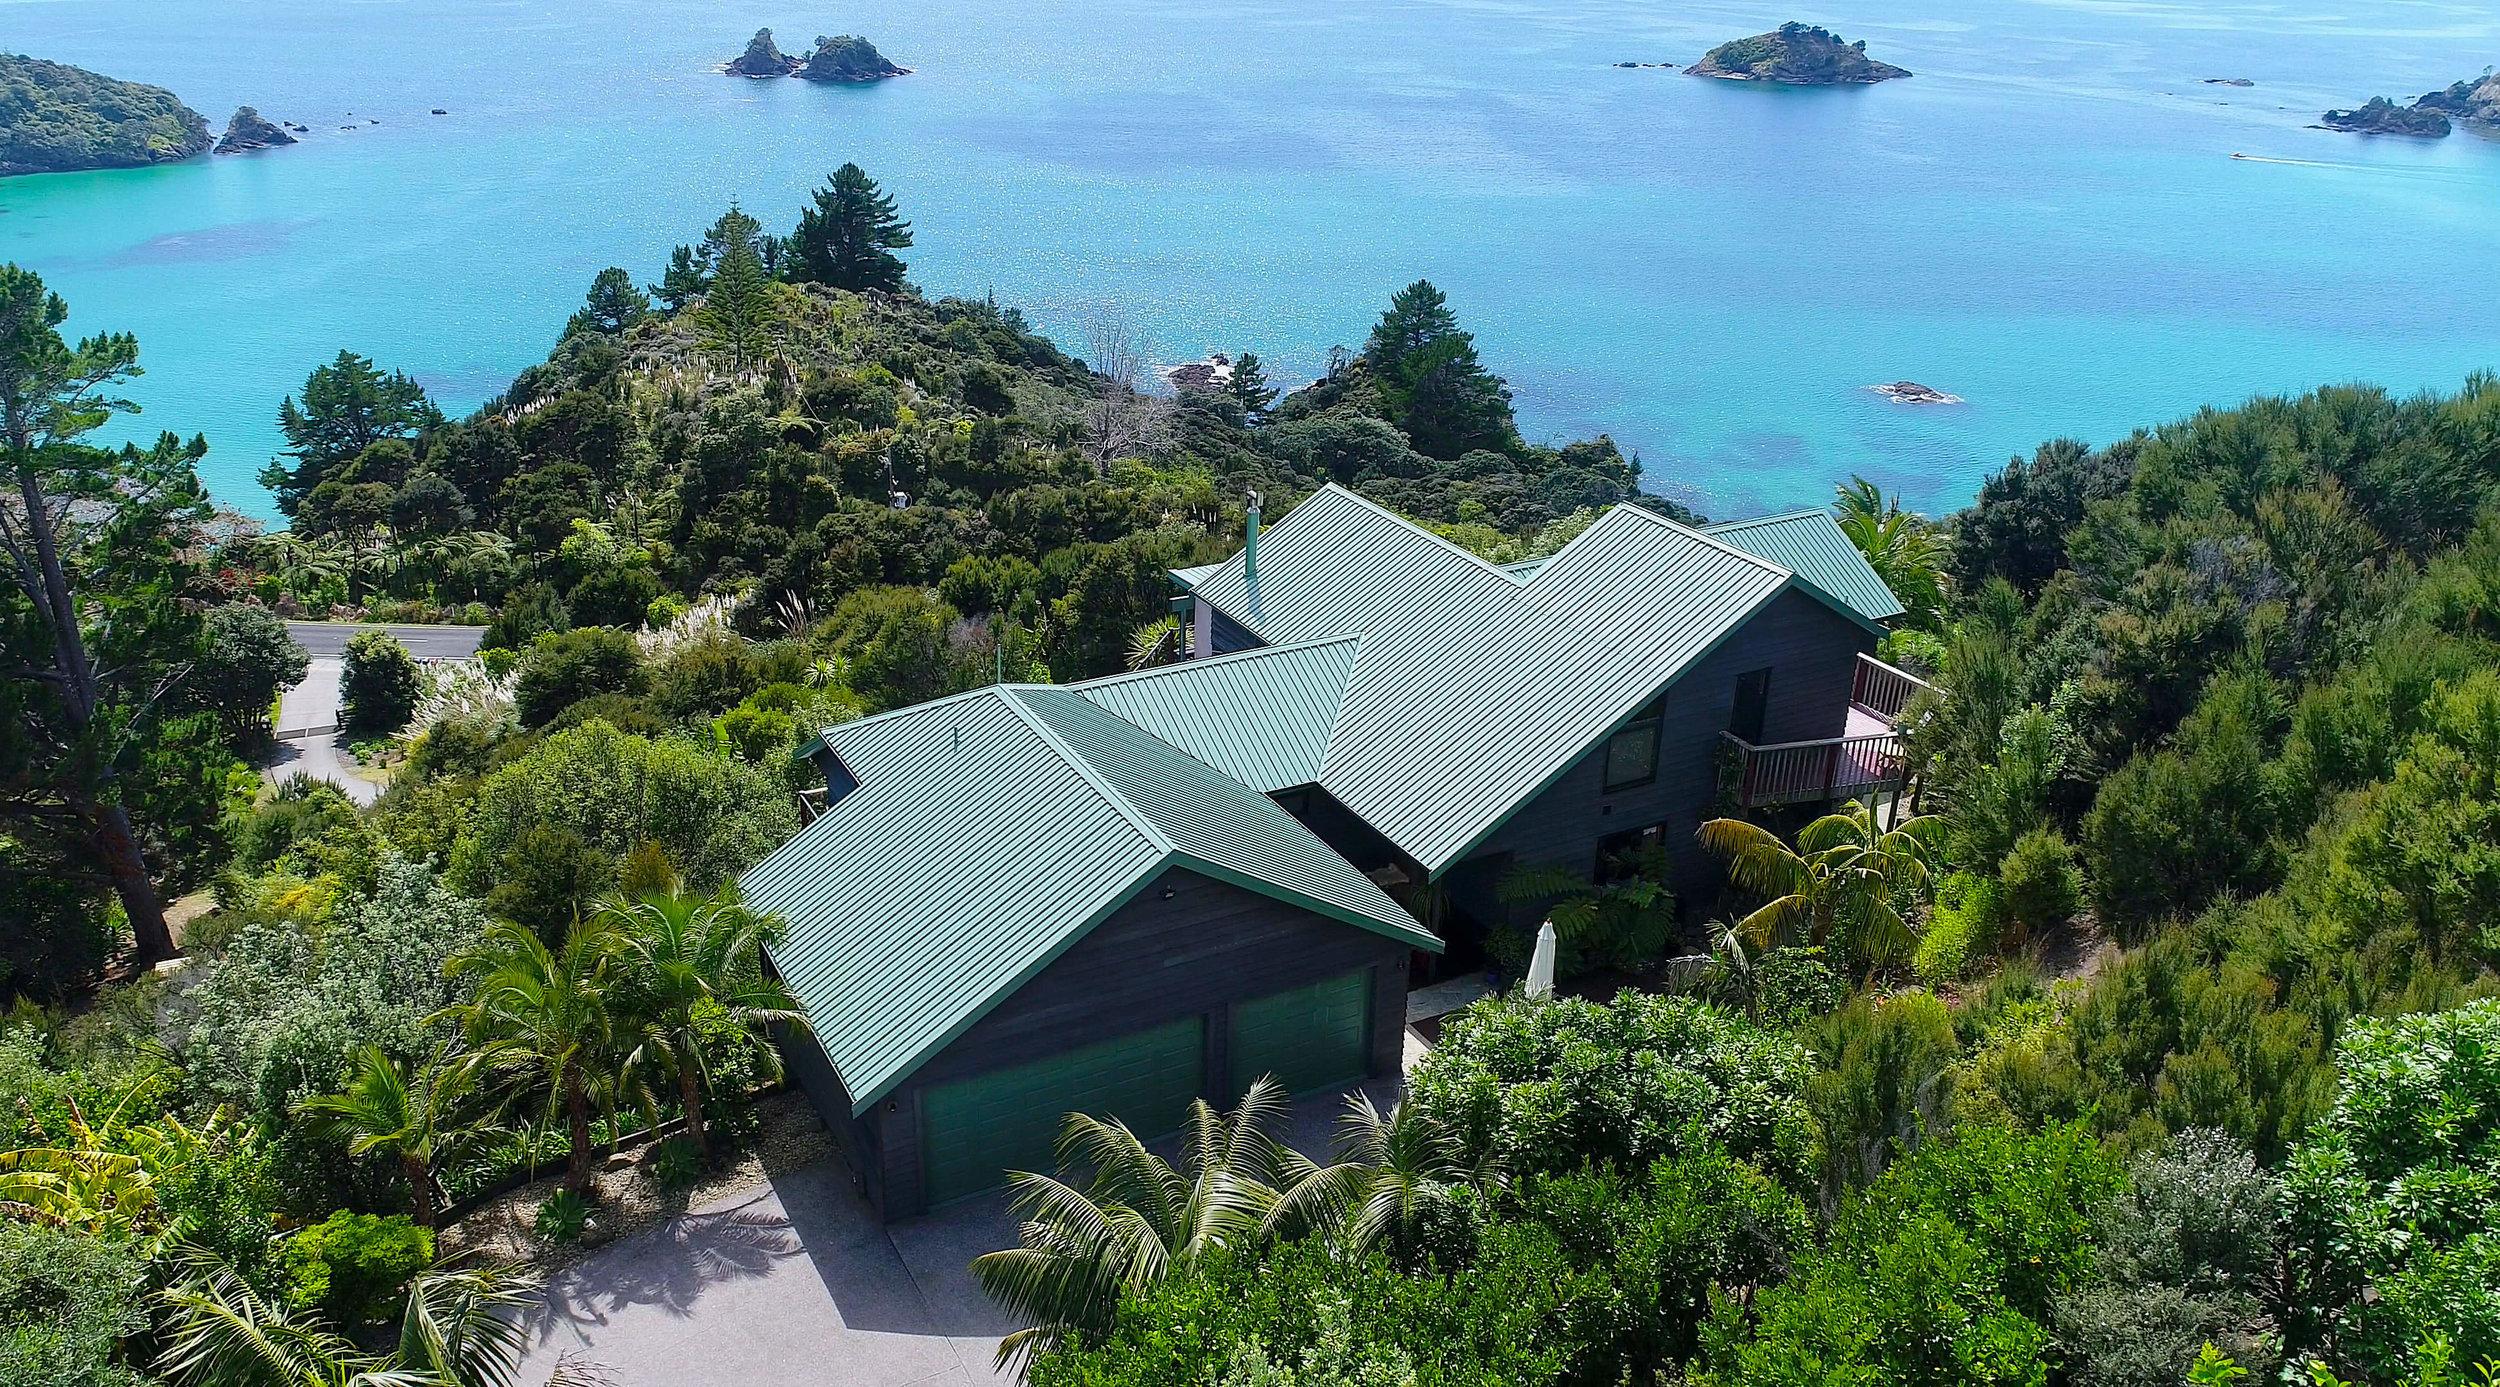 Te_Koha_Lodge_Lower_House_Northland_New_Zealand.jpg